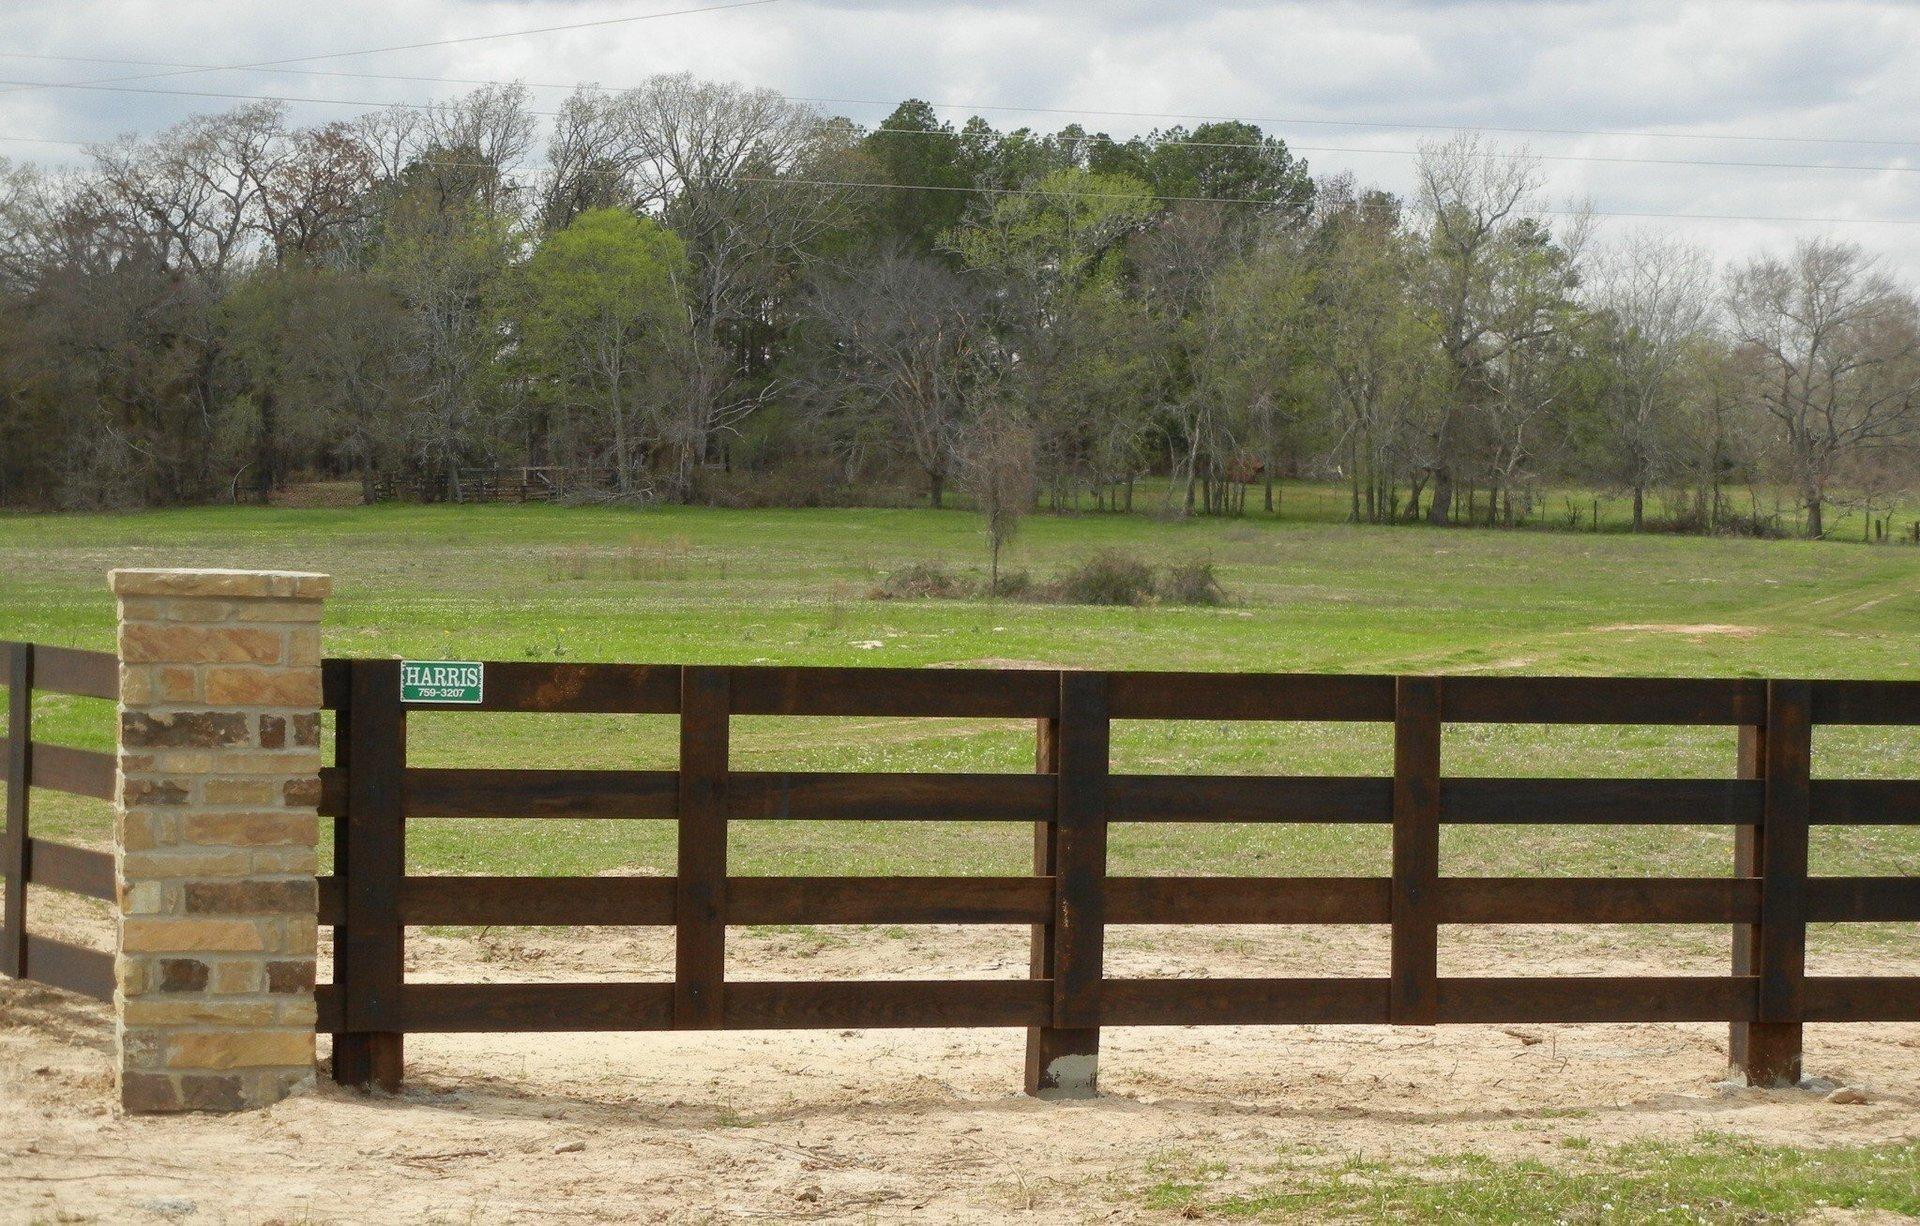 Farm fence Clipart Farm Fencing Acreage Fences Agricultural Fencing Ranch Fencing White Oak Tx